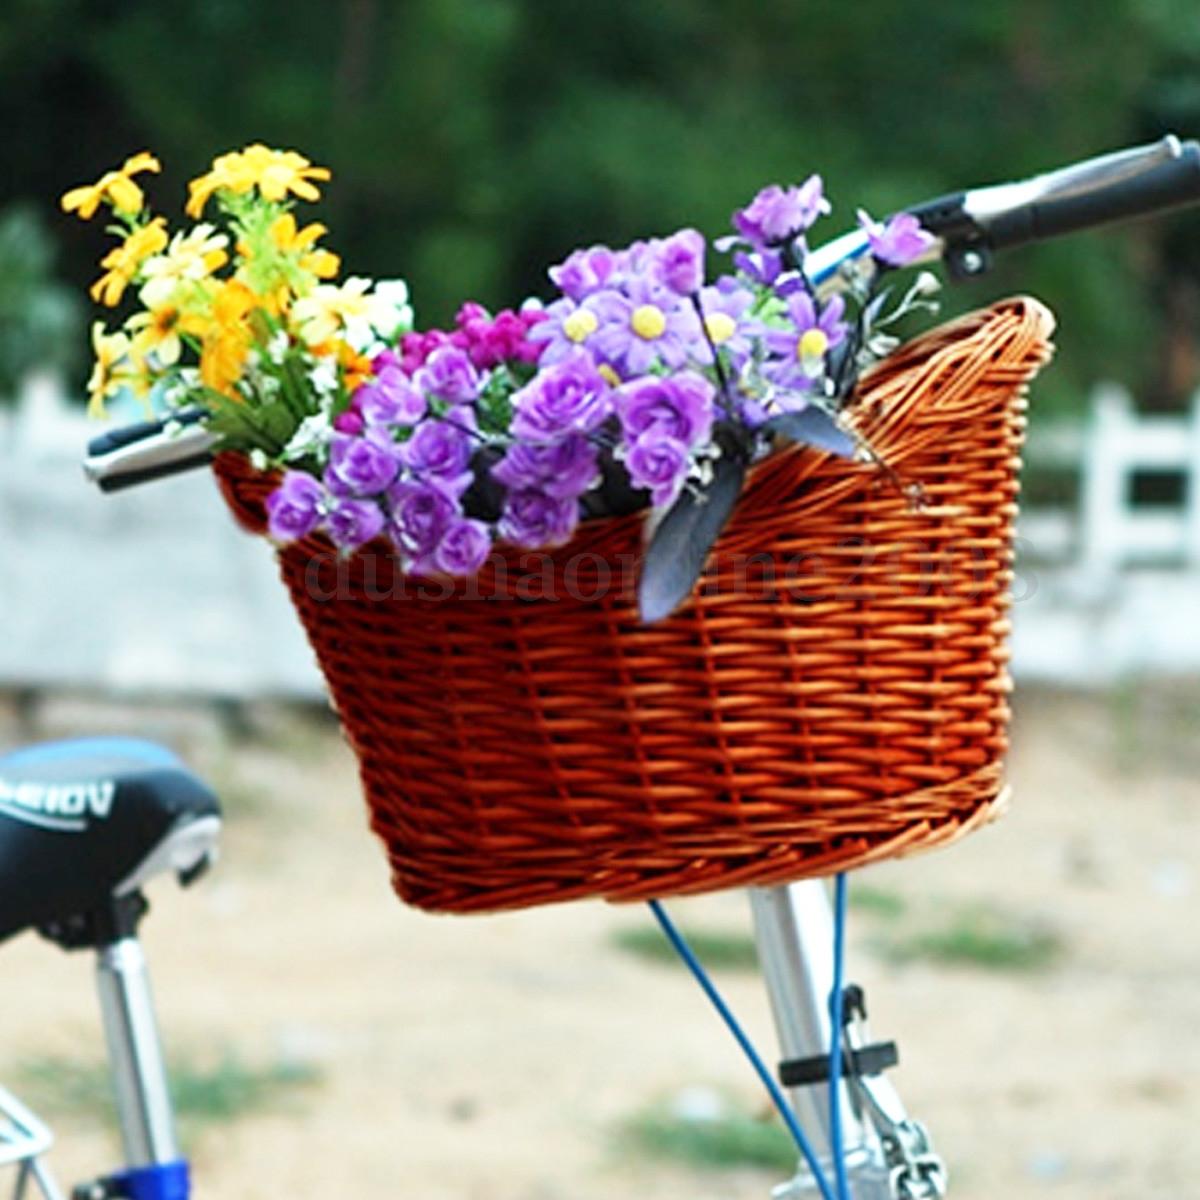 Sports, vacances > Cyclisme, vélos > Accessoires de vélos > Paniers